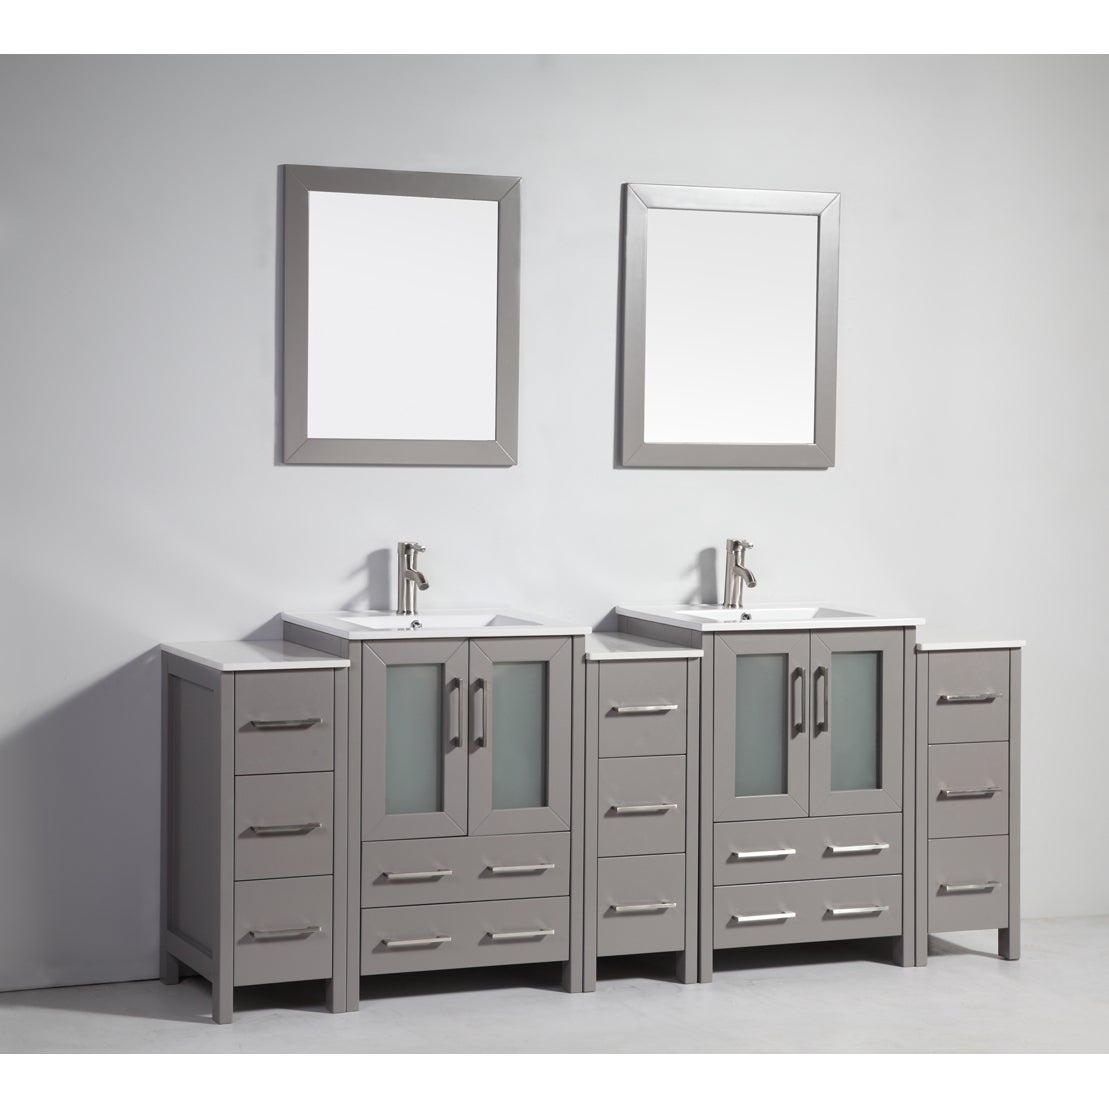 Vanity Art 84-Inch Double Sink Bathroom Vanity Set 13 | eBay